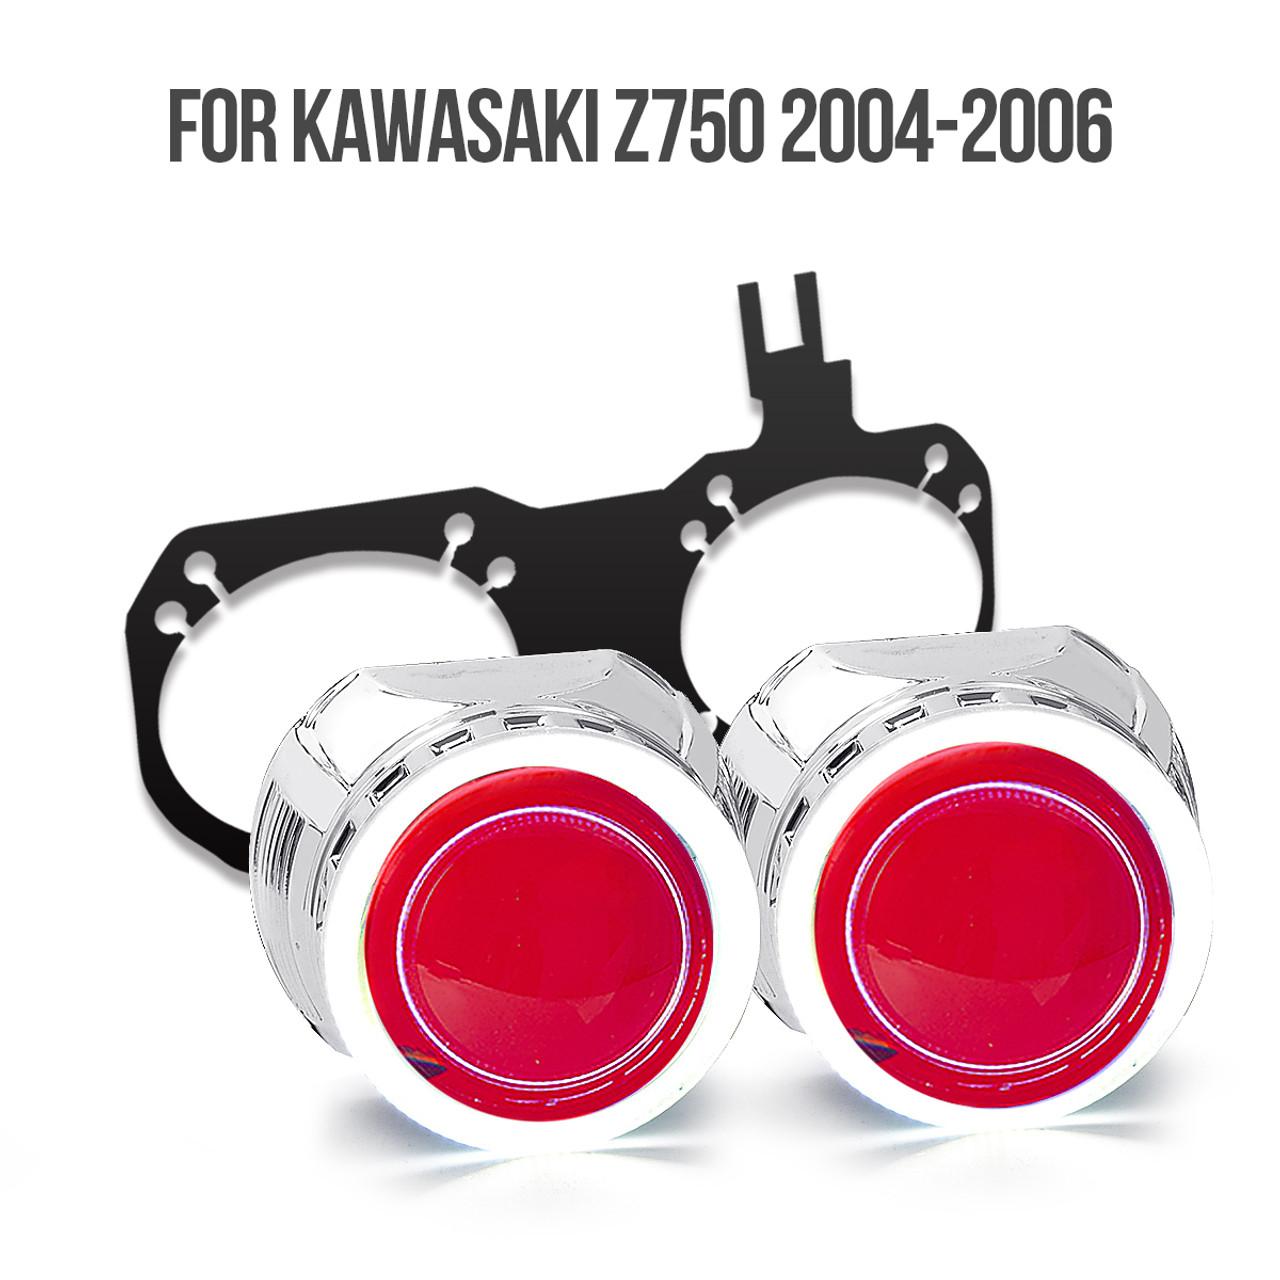 small resolution of 2004 kawasaki z750 hid projector kit